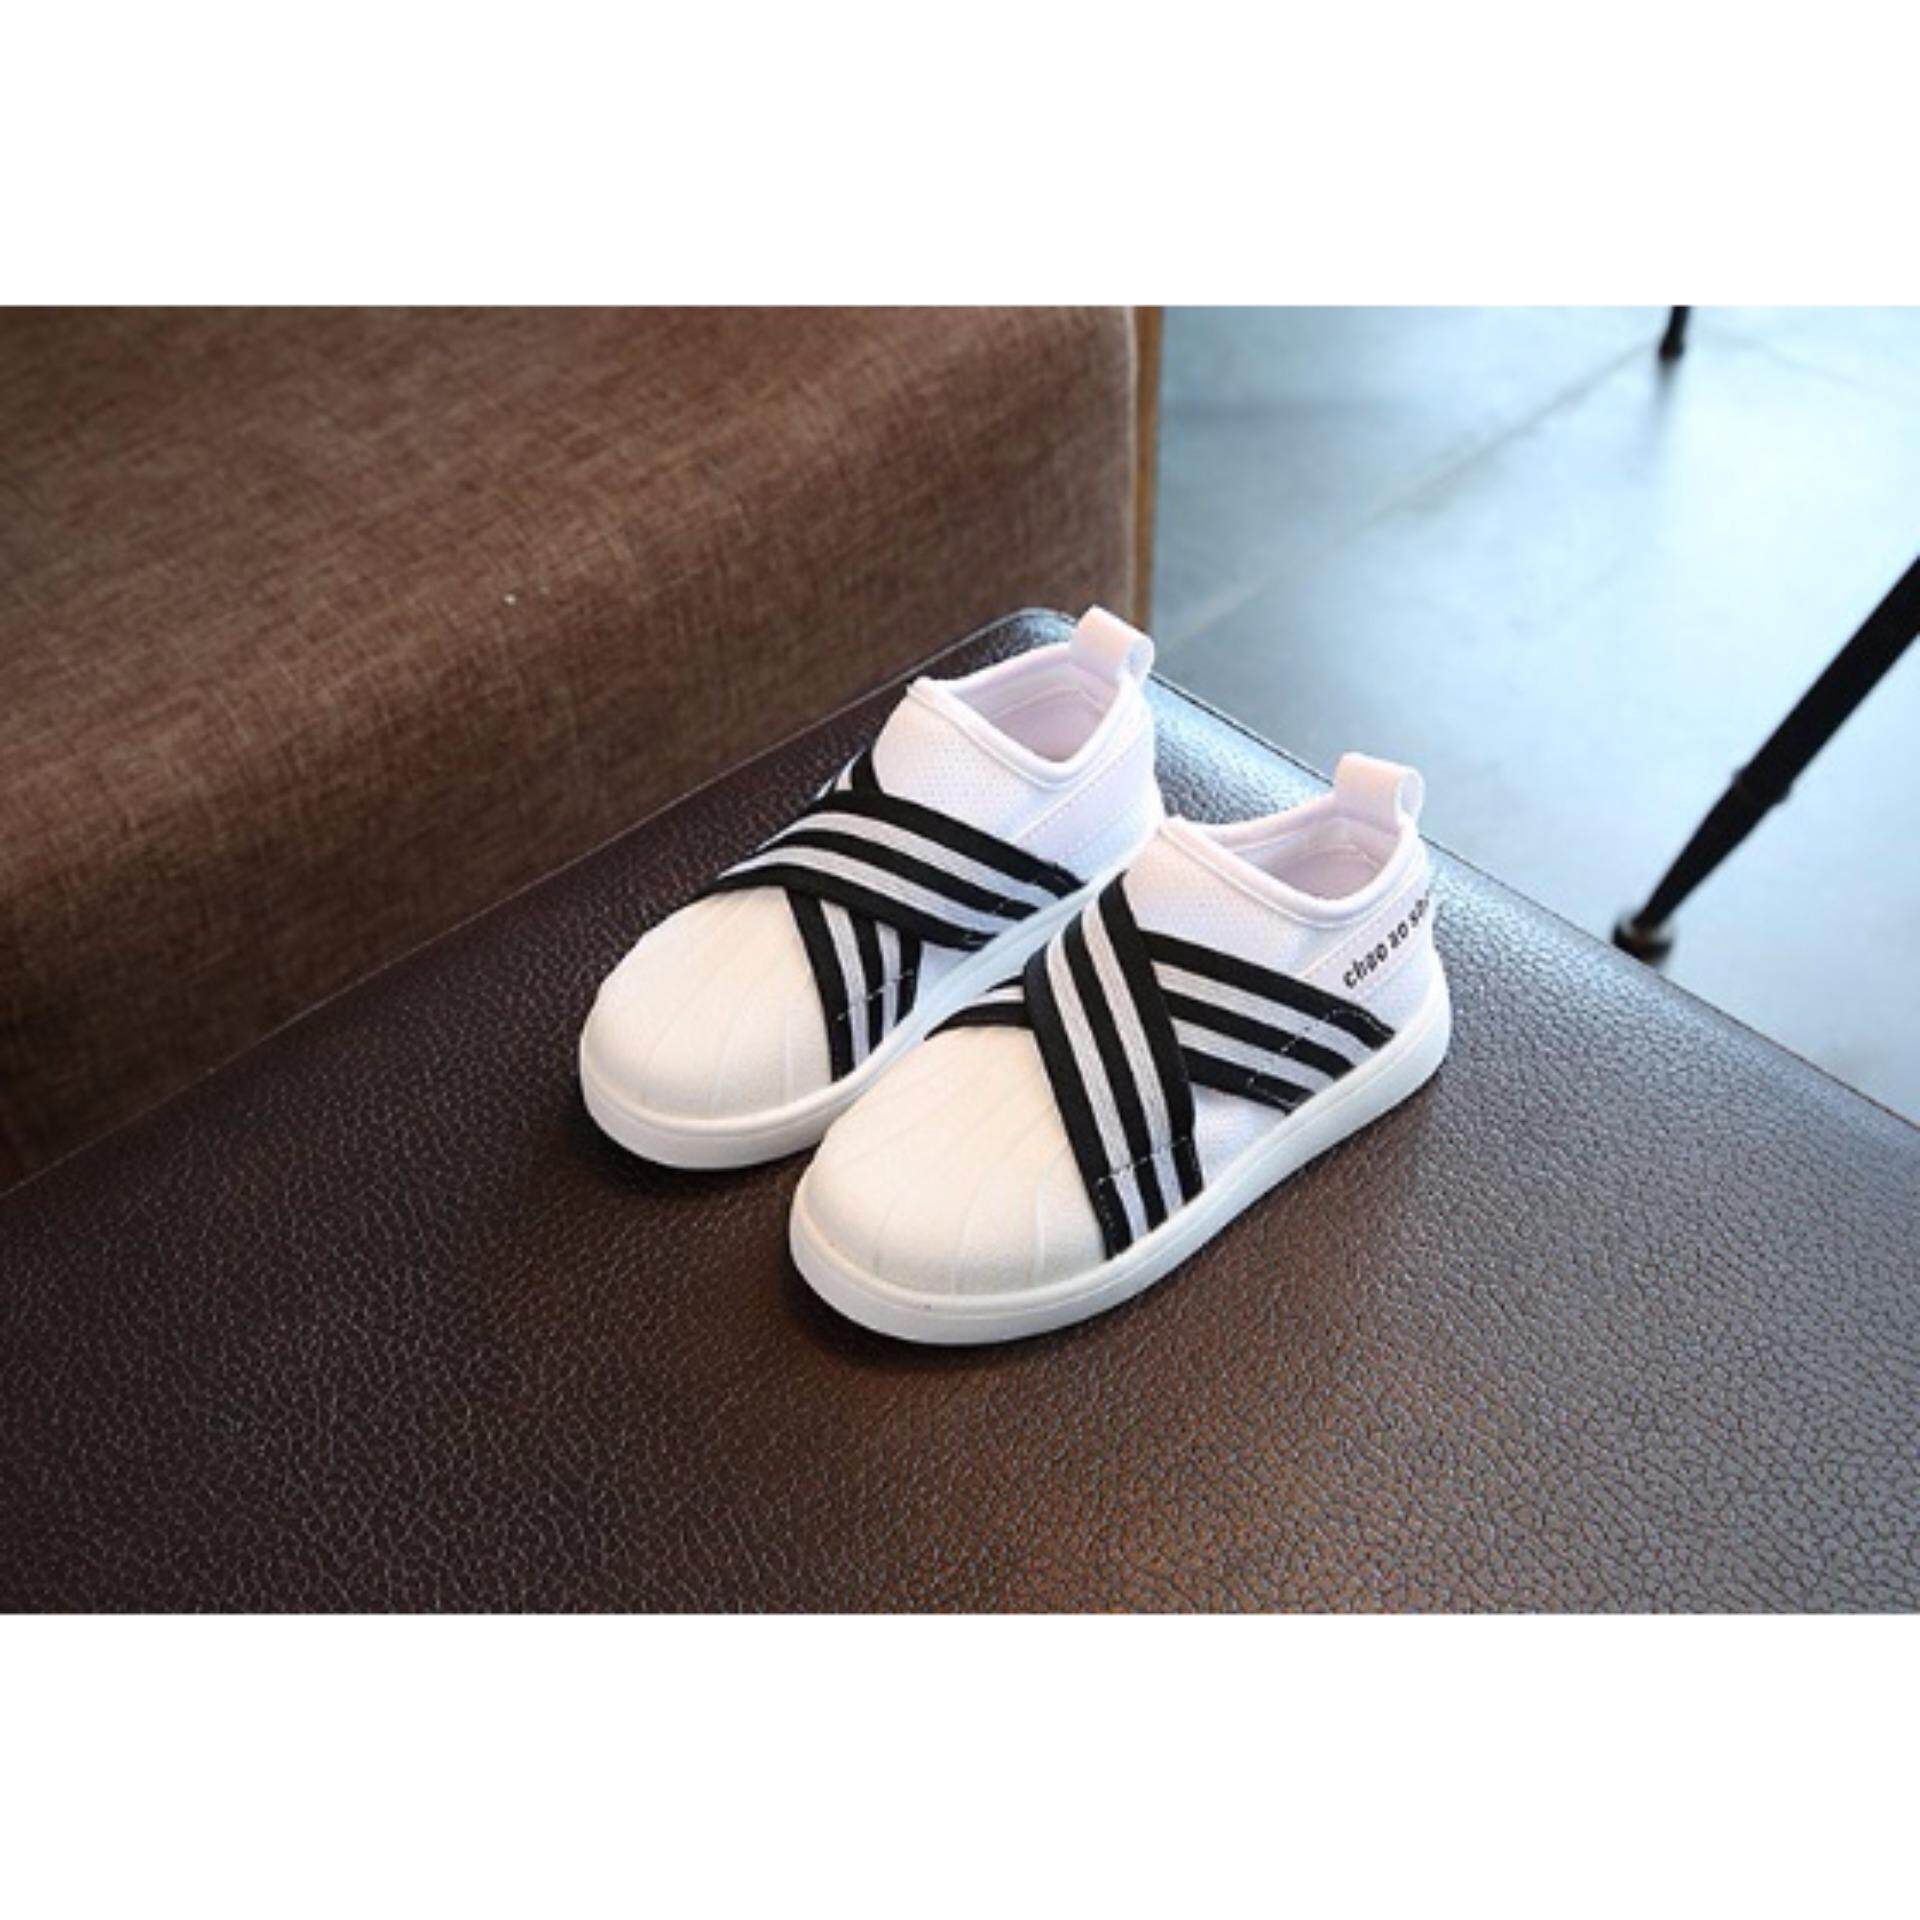 D2kids รองเท้าผ้าใบสีขาวคาดดำขาว